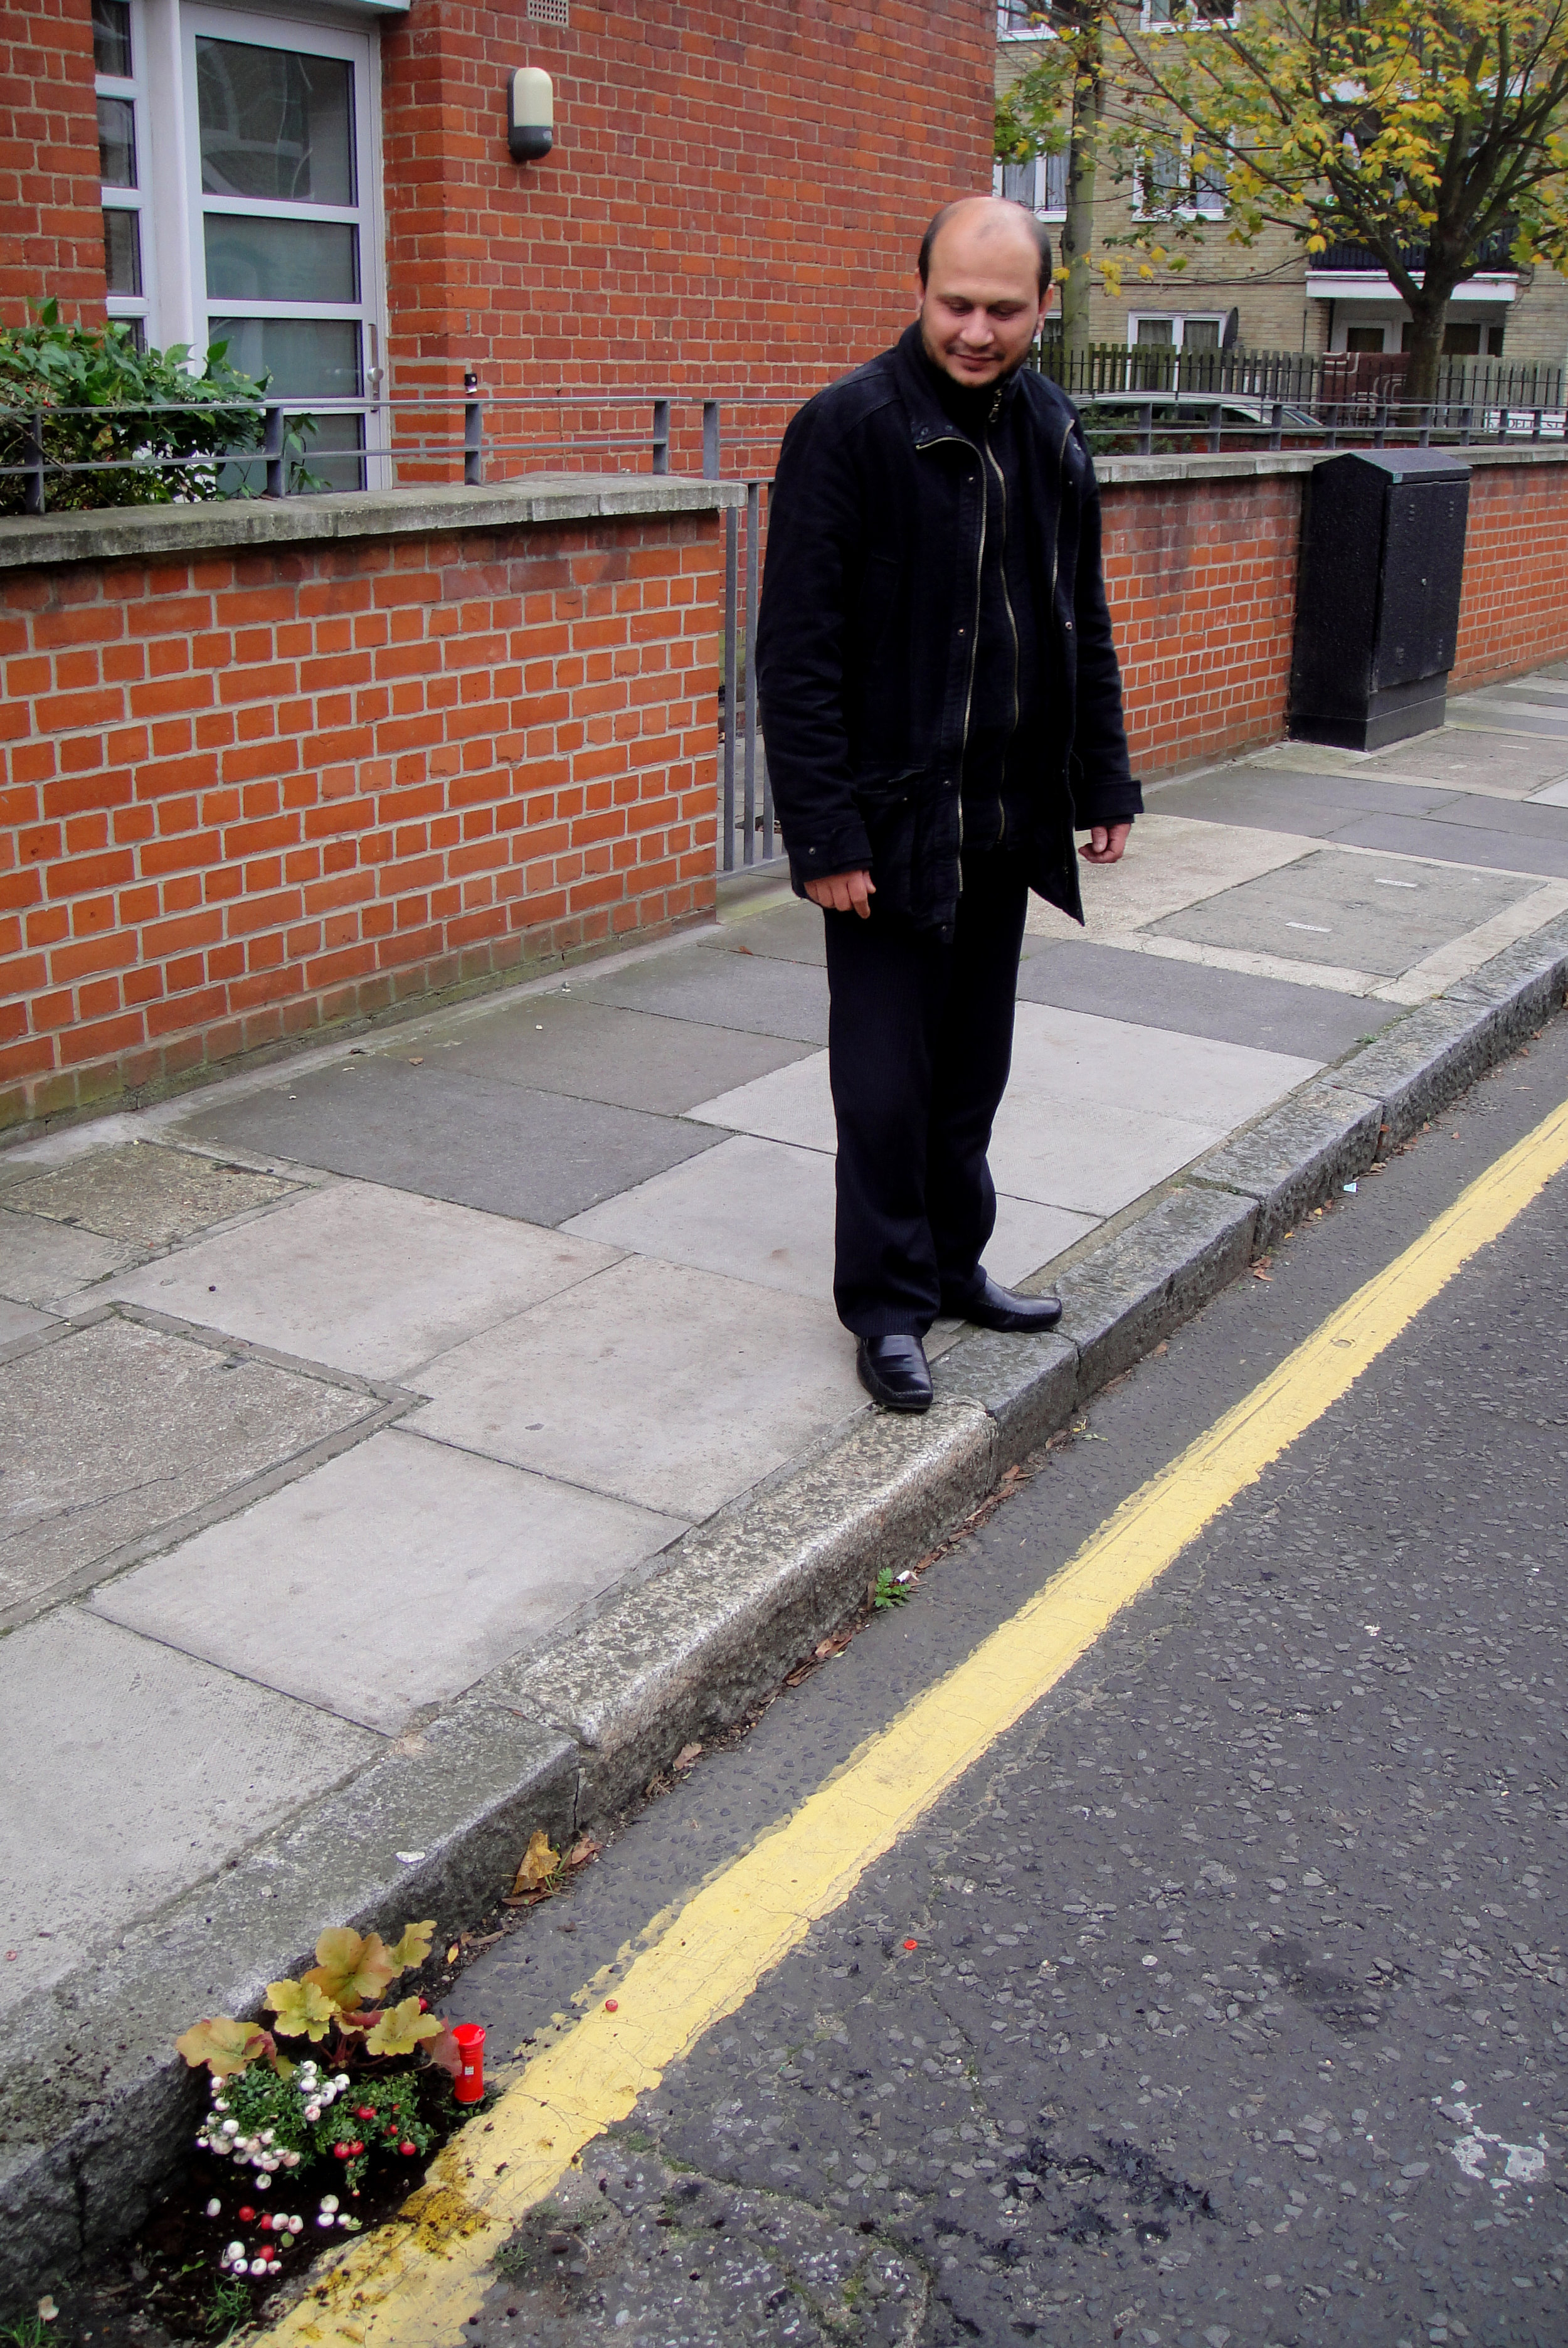 pothole-garden-royal-post-post-box-east-london-observer.jpg